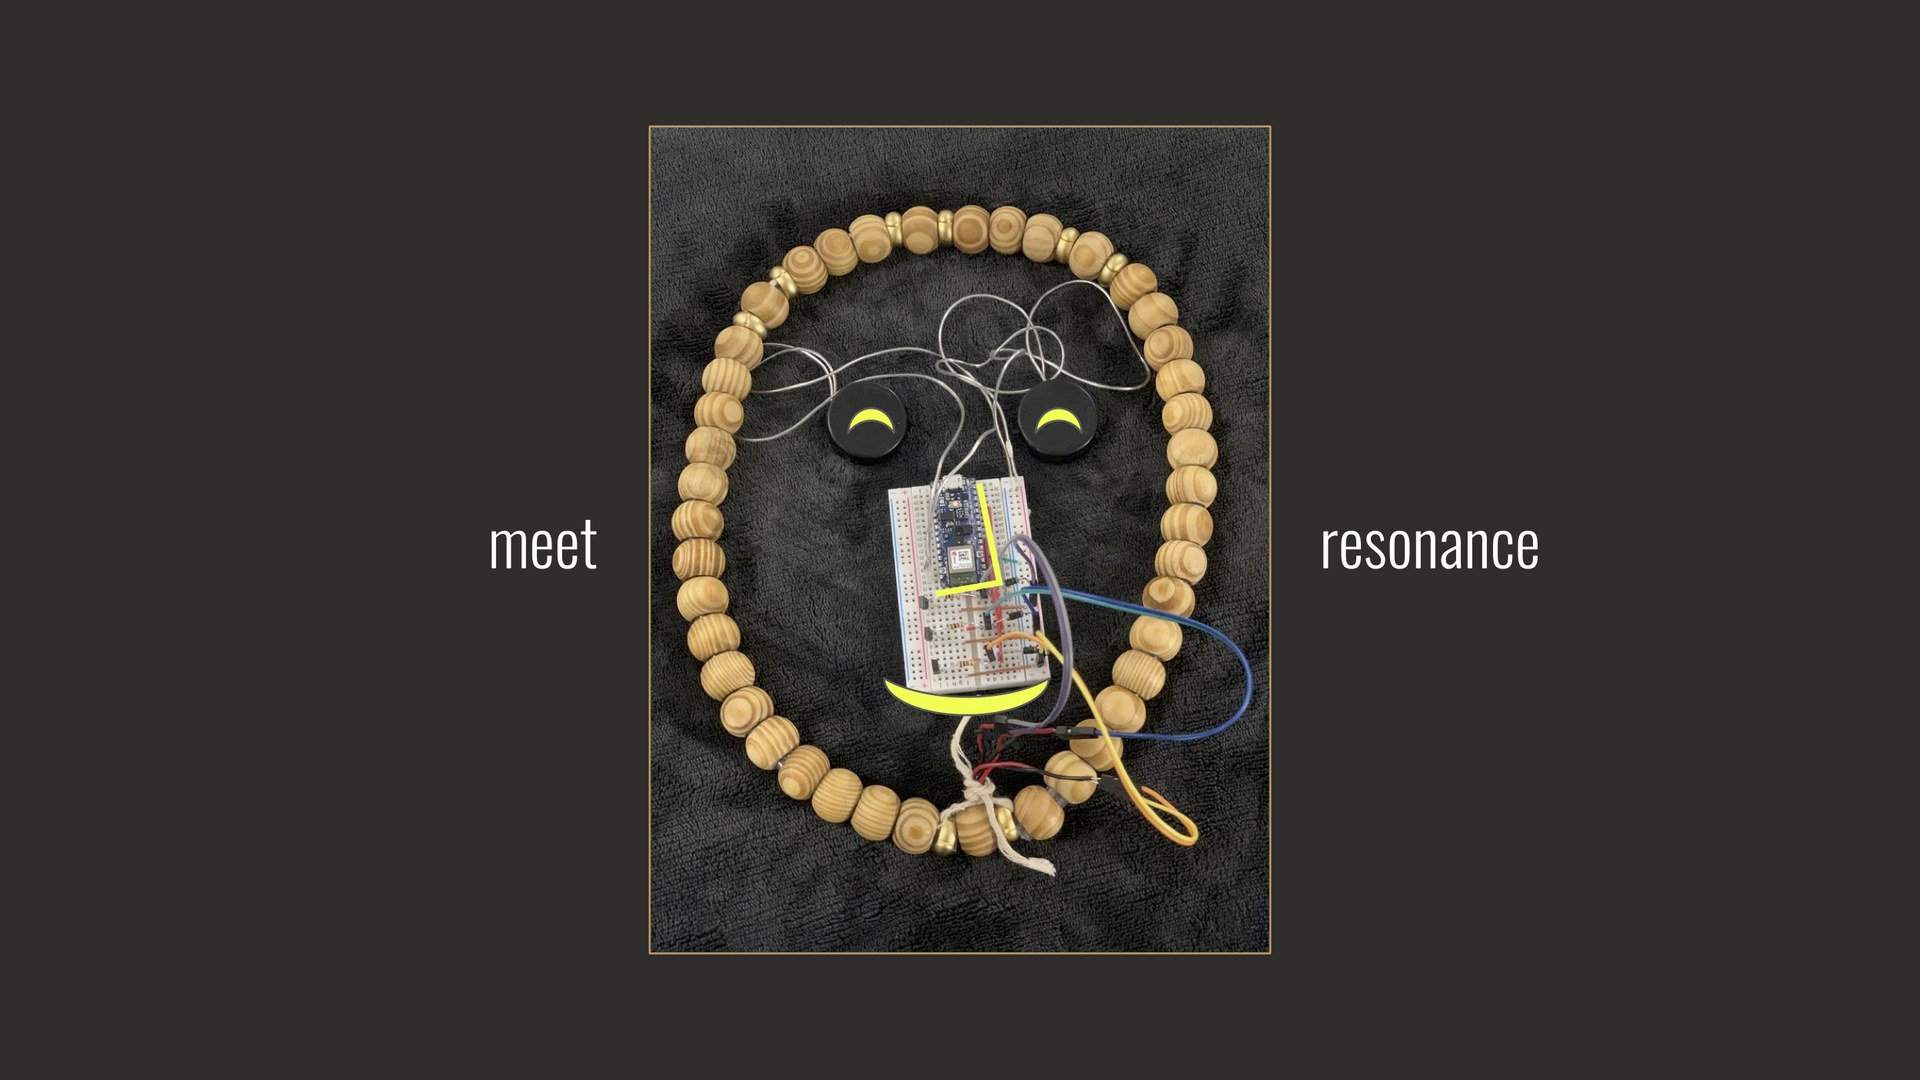 Meet resonance